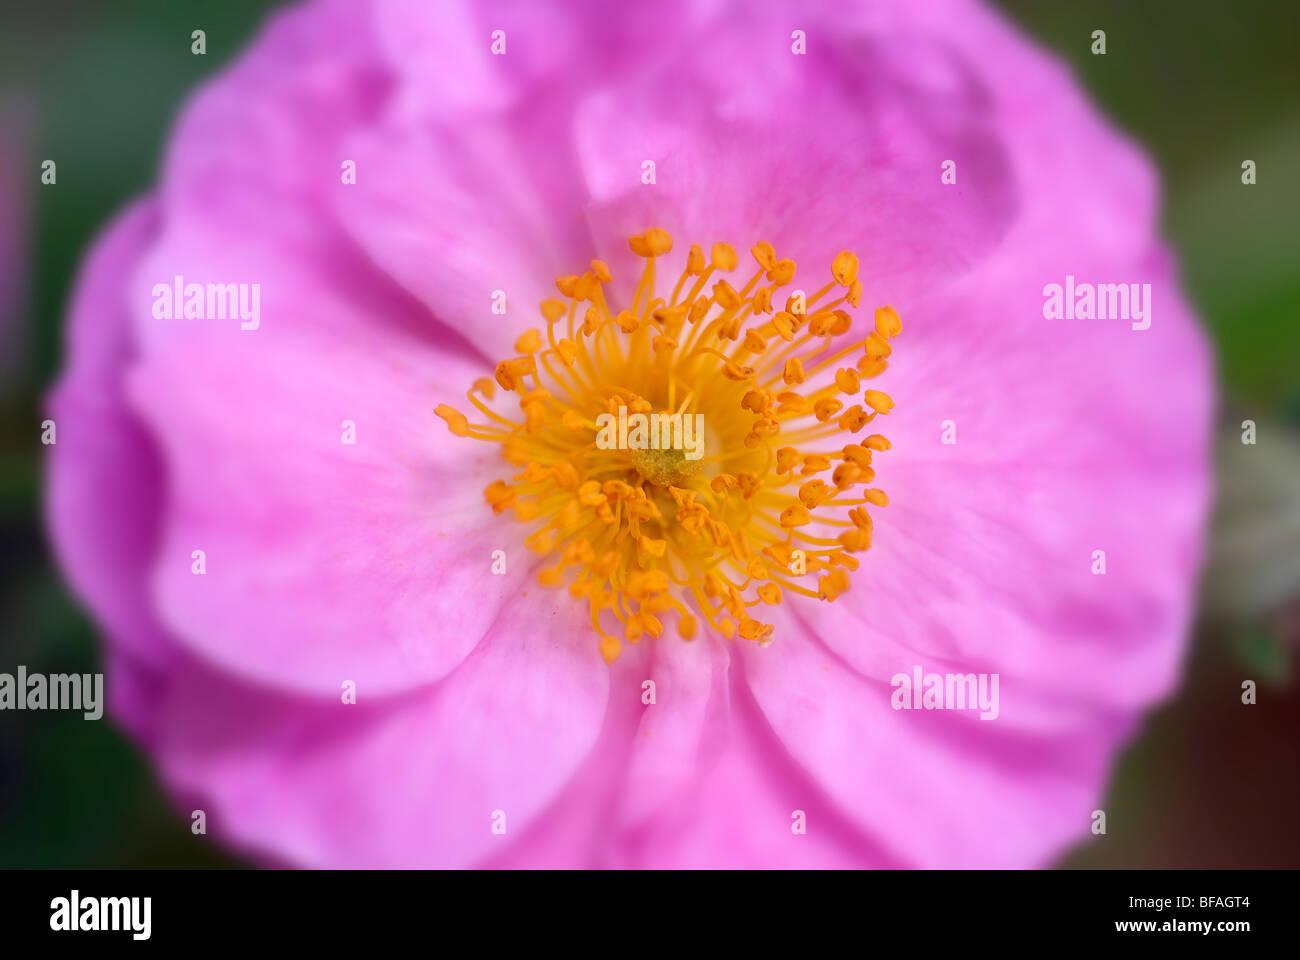 Pink miniature rose, pollen, magenta rose Stock Photo